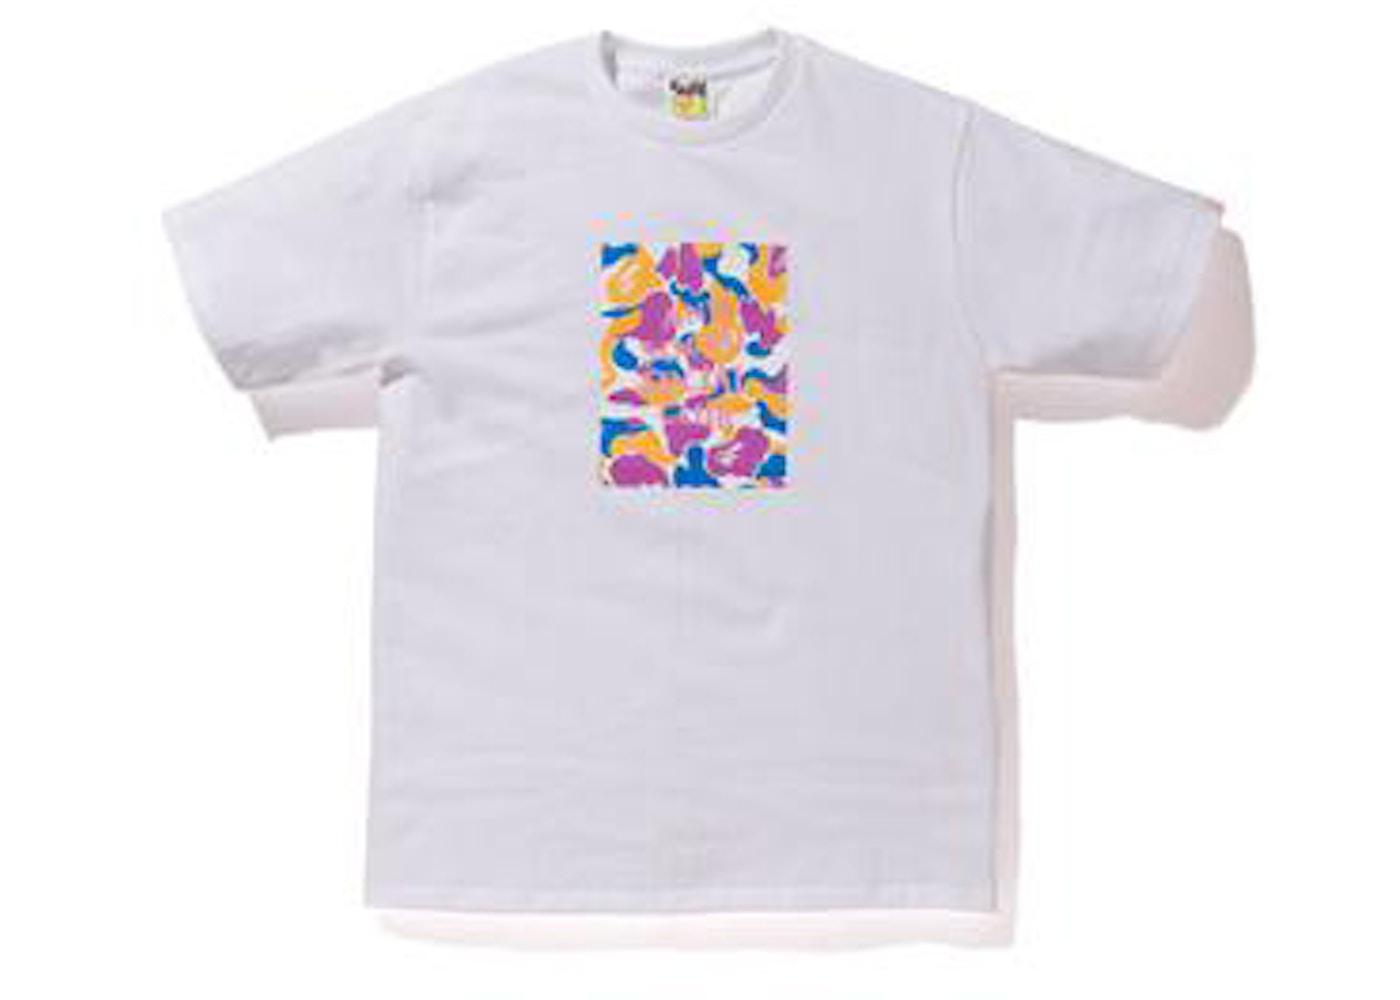 7744473c4a70 Streetwear - Bape T-Shirts - New Highest Bids